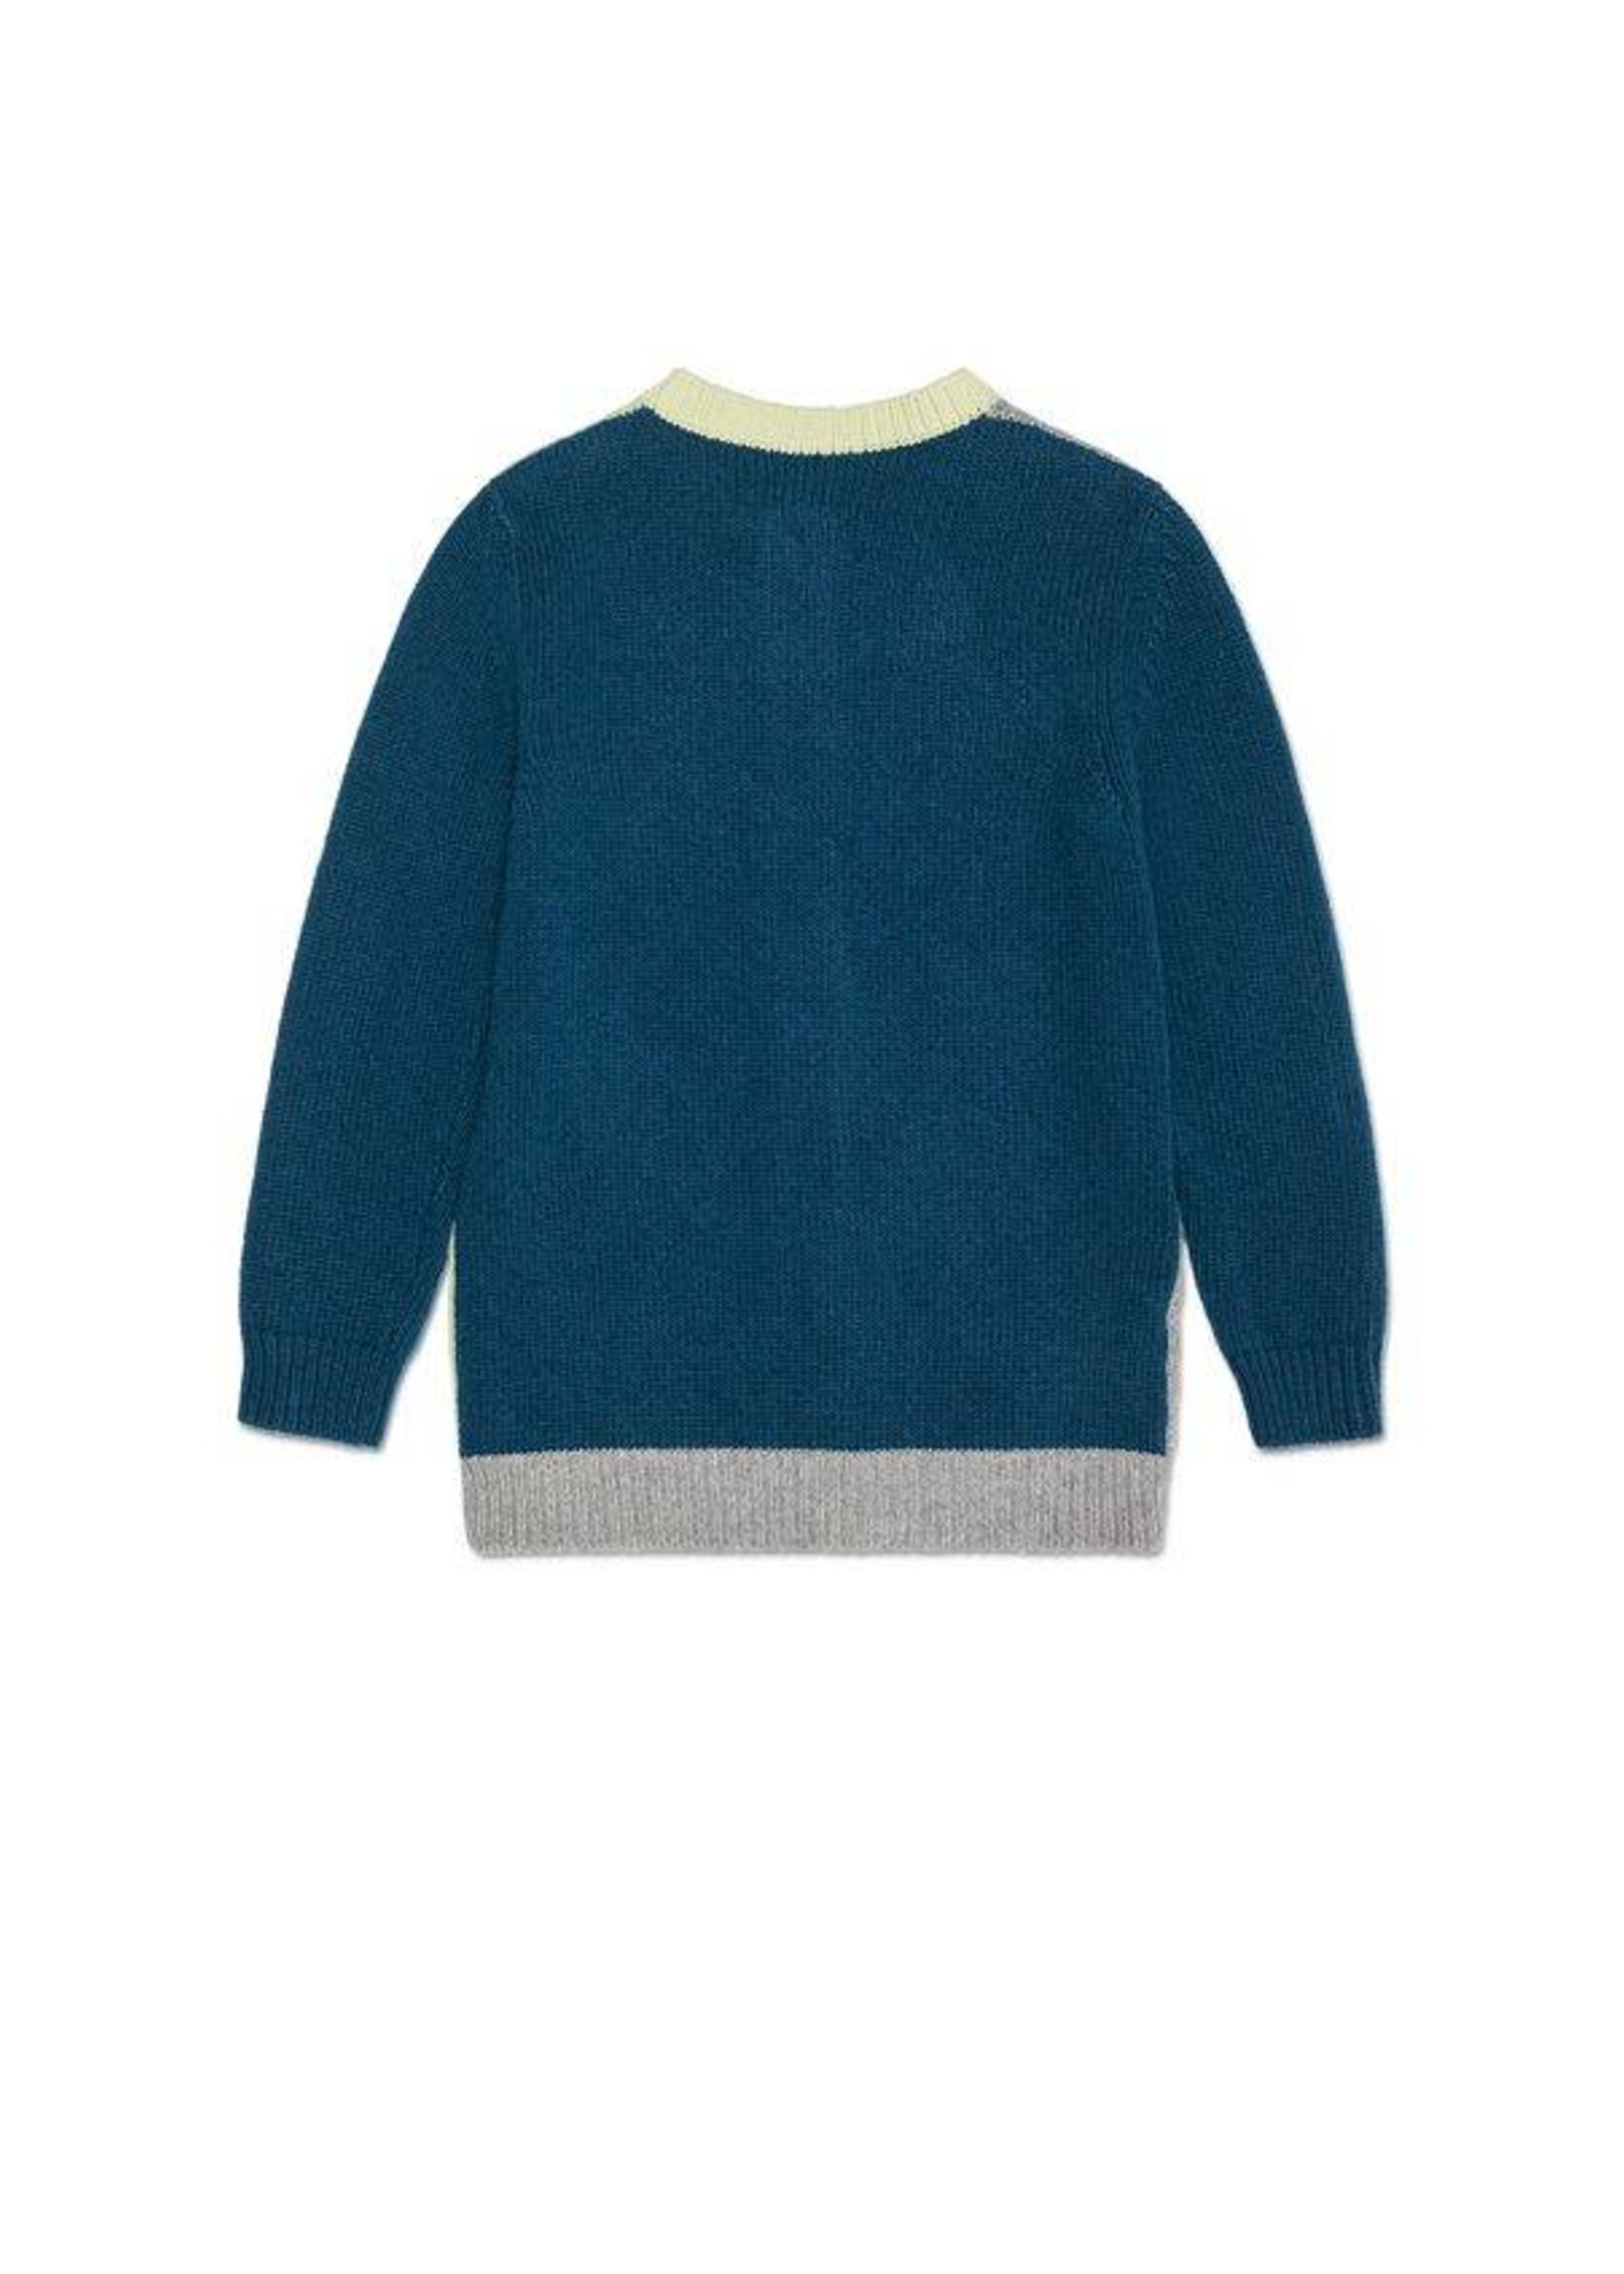 Marni Marni Girl Sweater